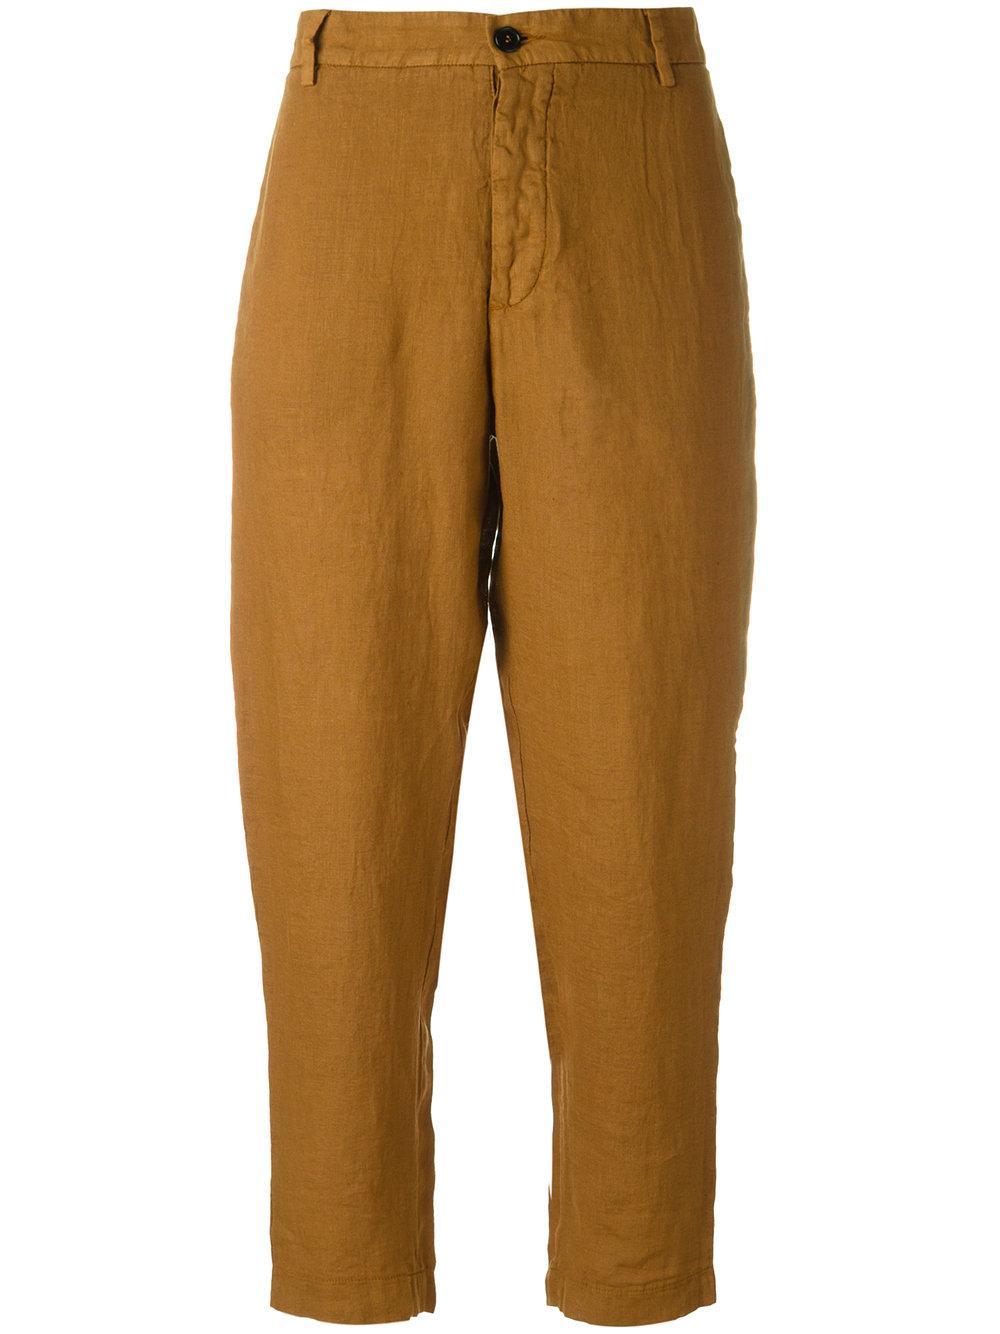 Free shipping and returns on Women's Brown Pants & Leggings at ajaykumarchejarla.ml